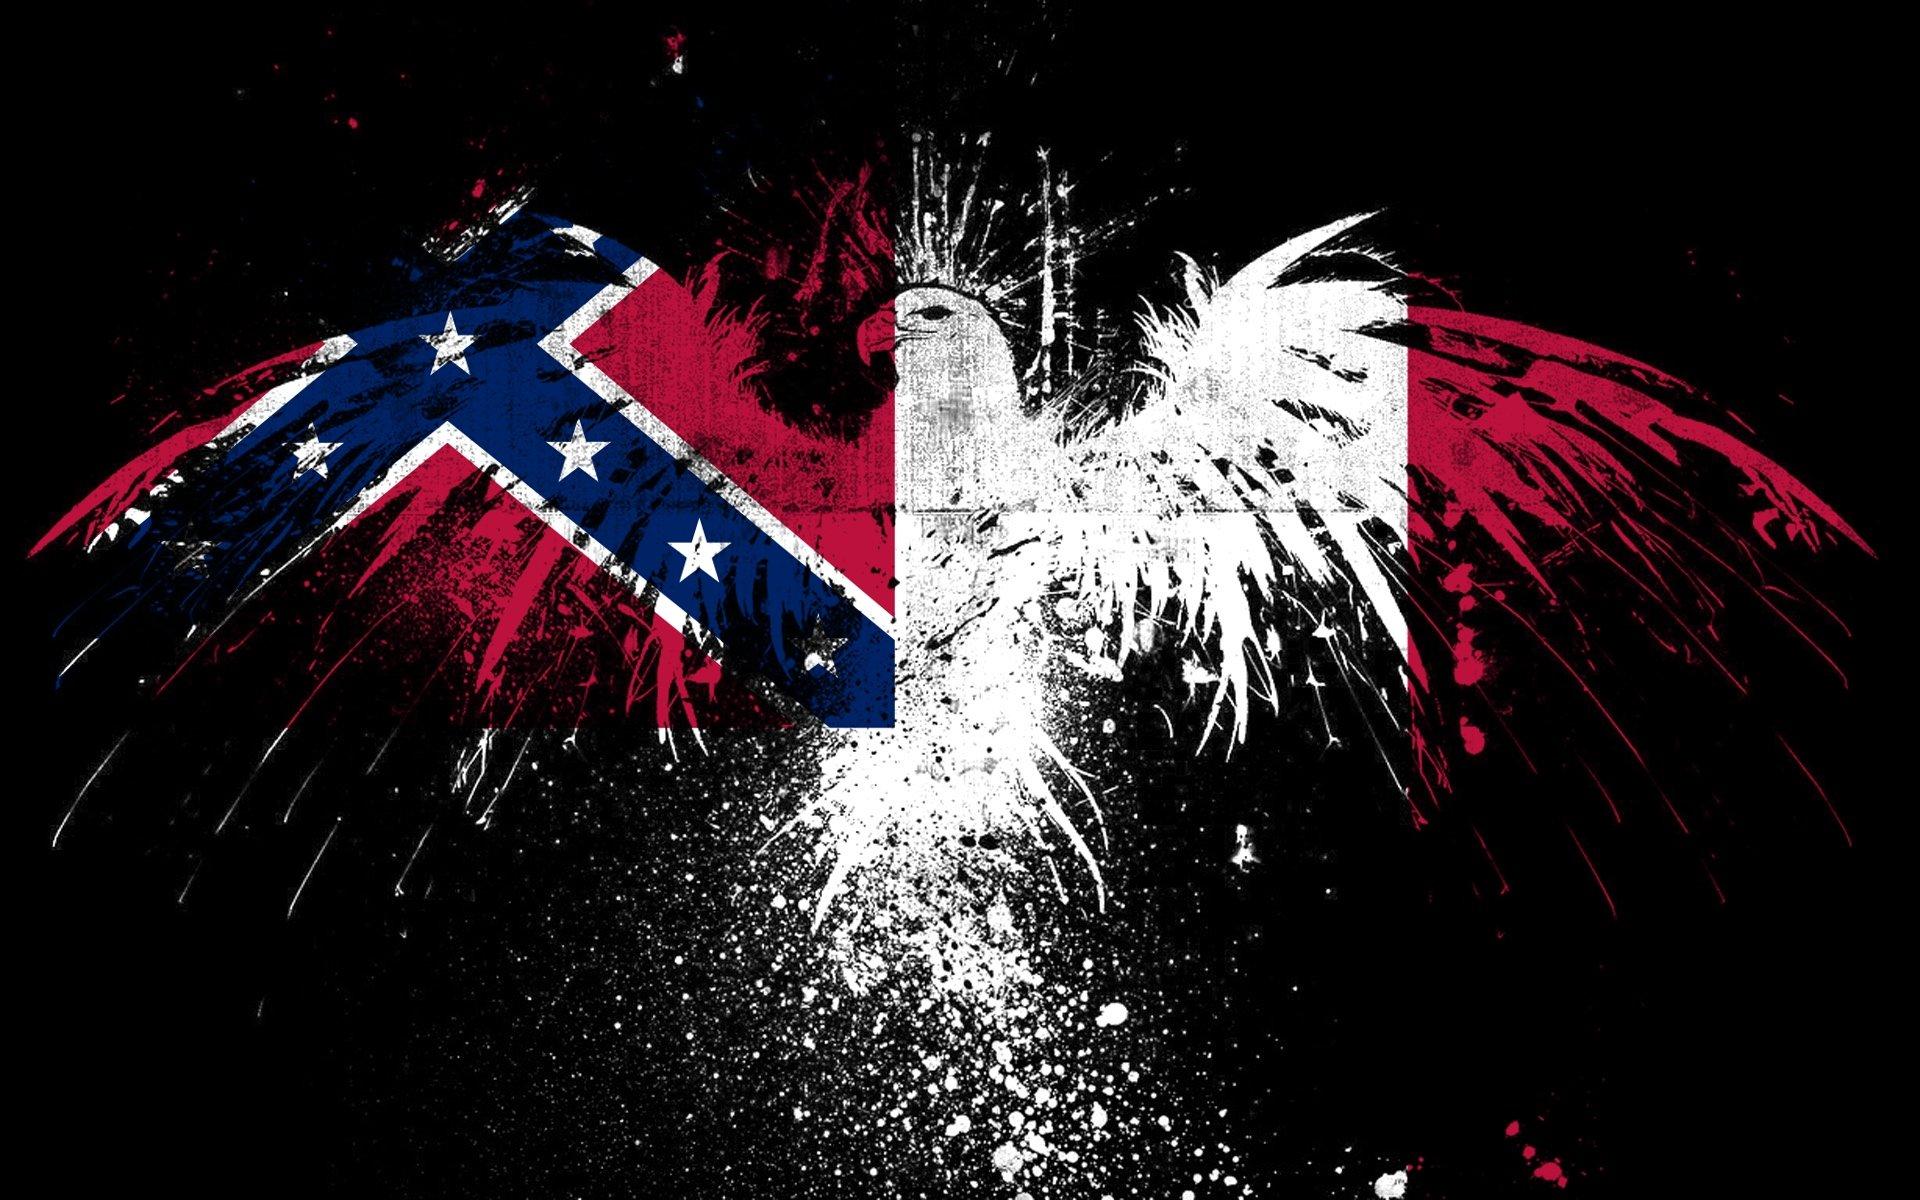 CONFEDERATE Flag Usa America United States Csa Civil War Rebel Dixie Military Poster Wallpaper